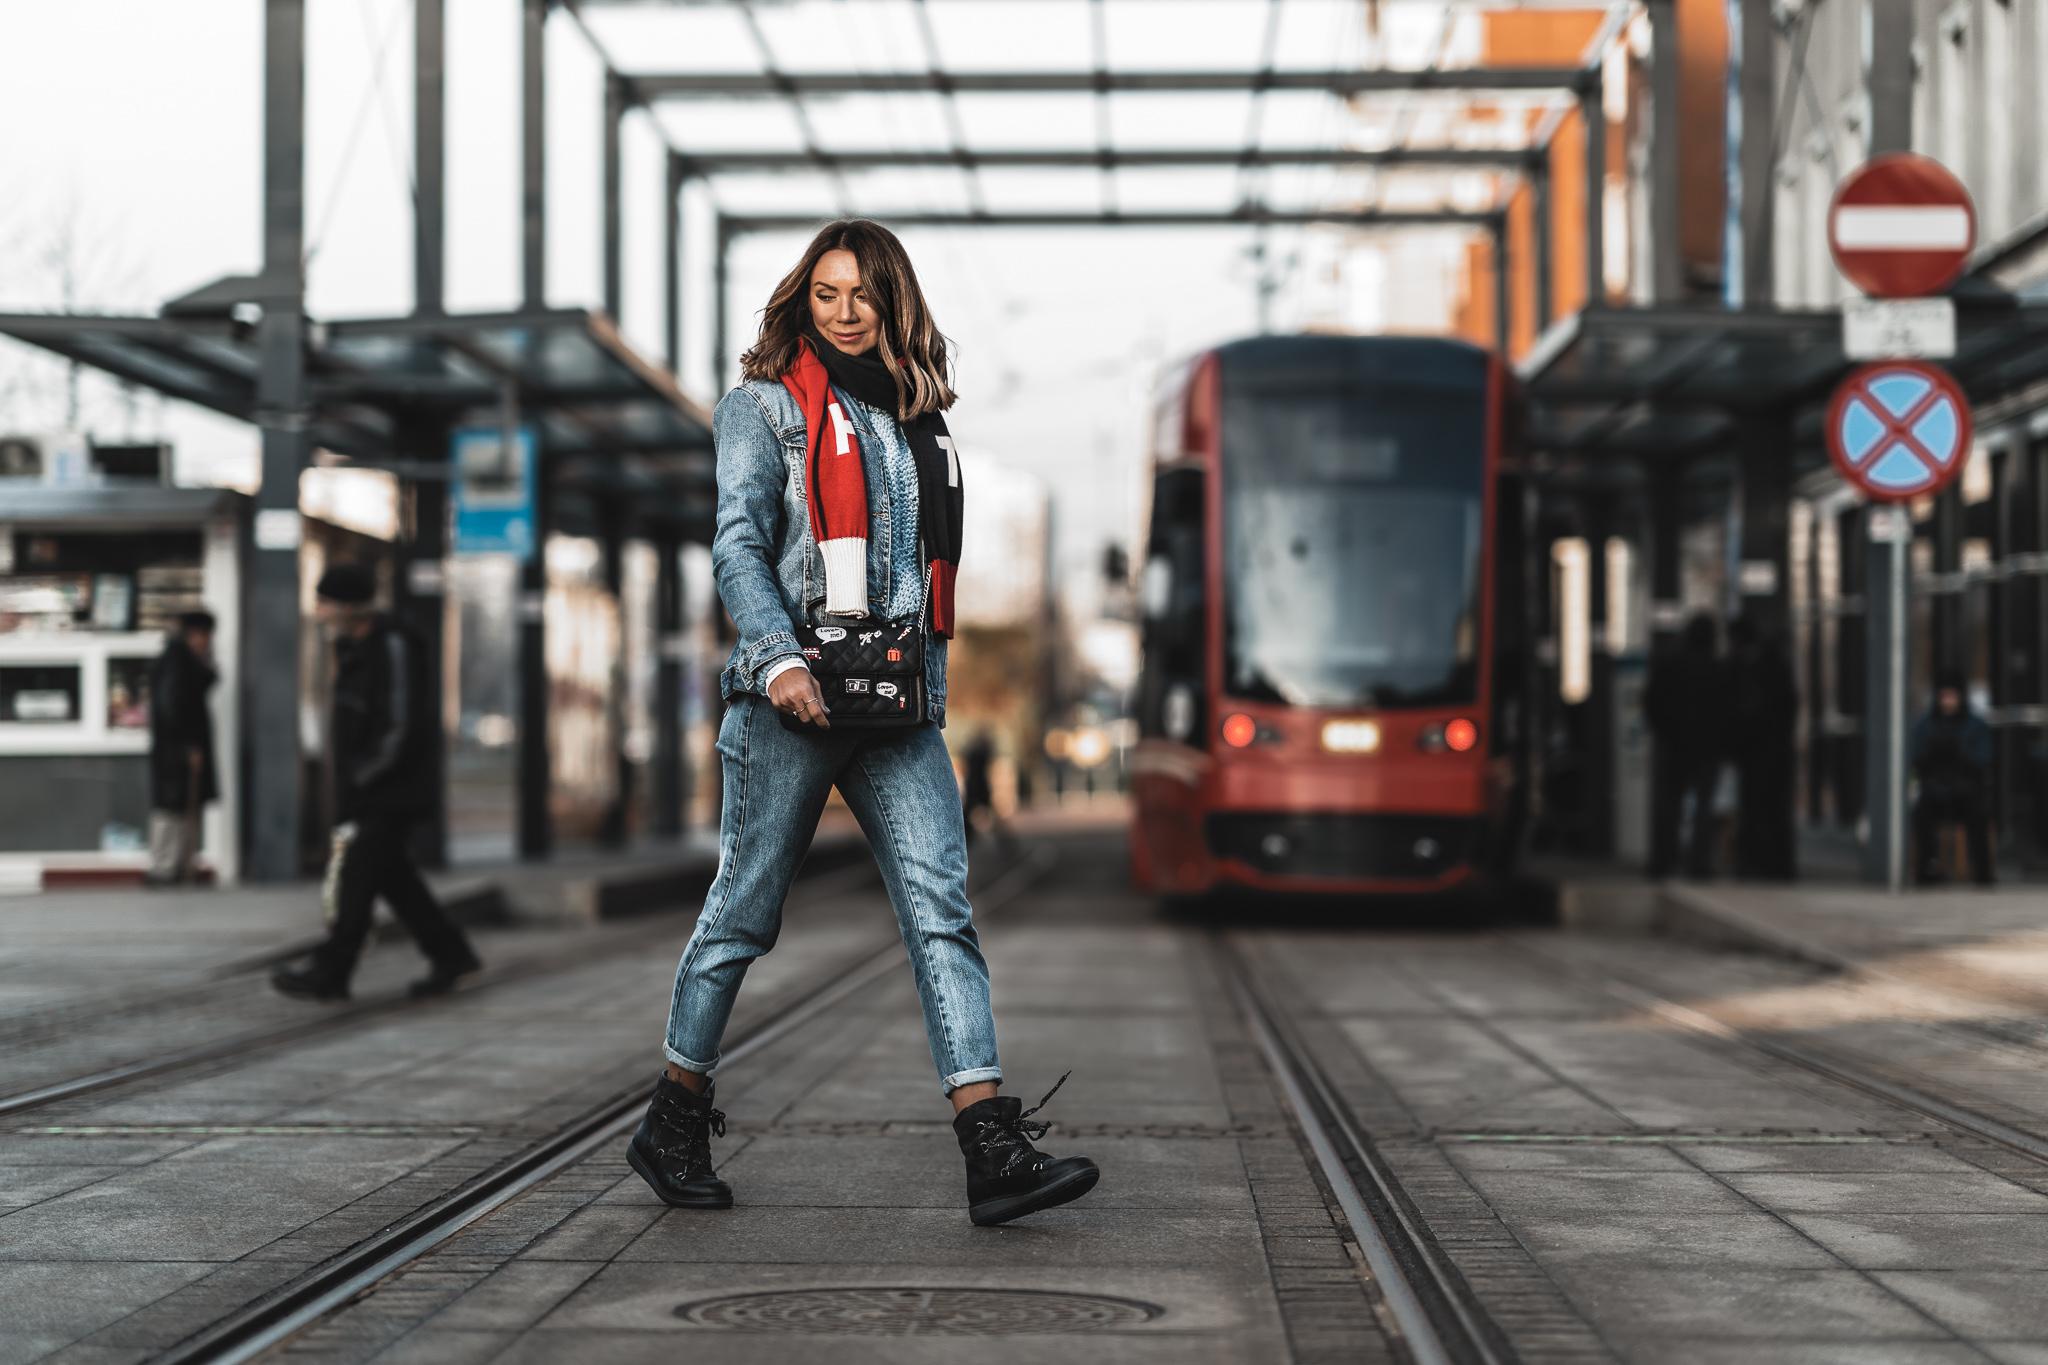 Buty śniegowce Tommy Hilfiger, Katowice, Sweter h&m, olivkablog, olivka blog, modna mama